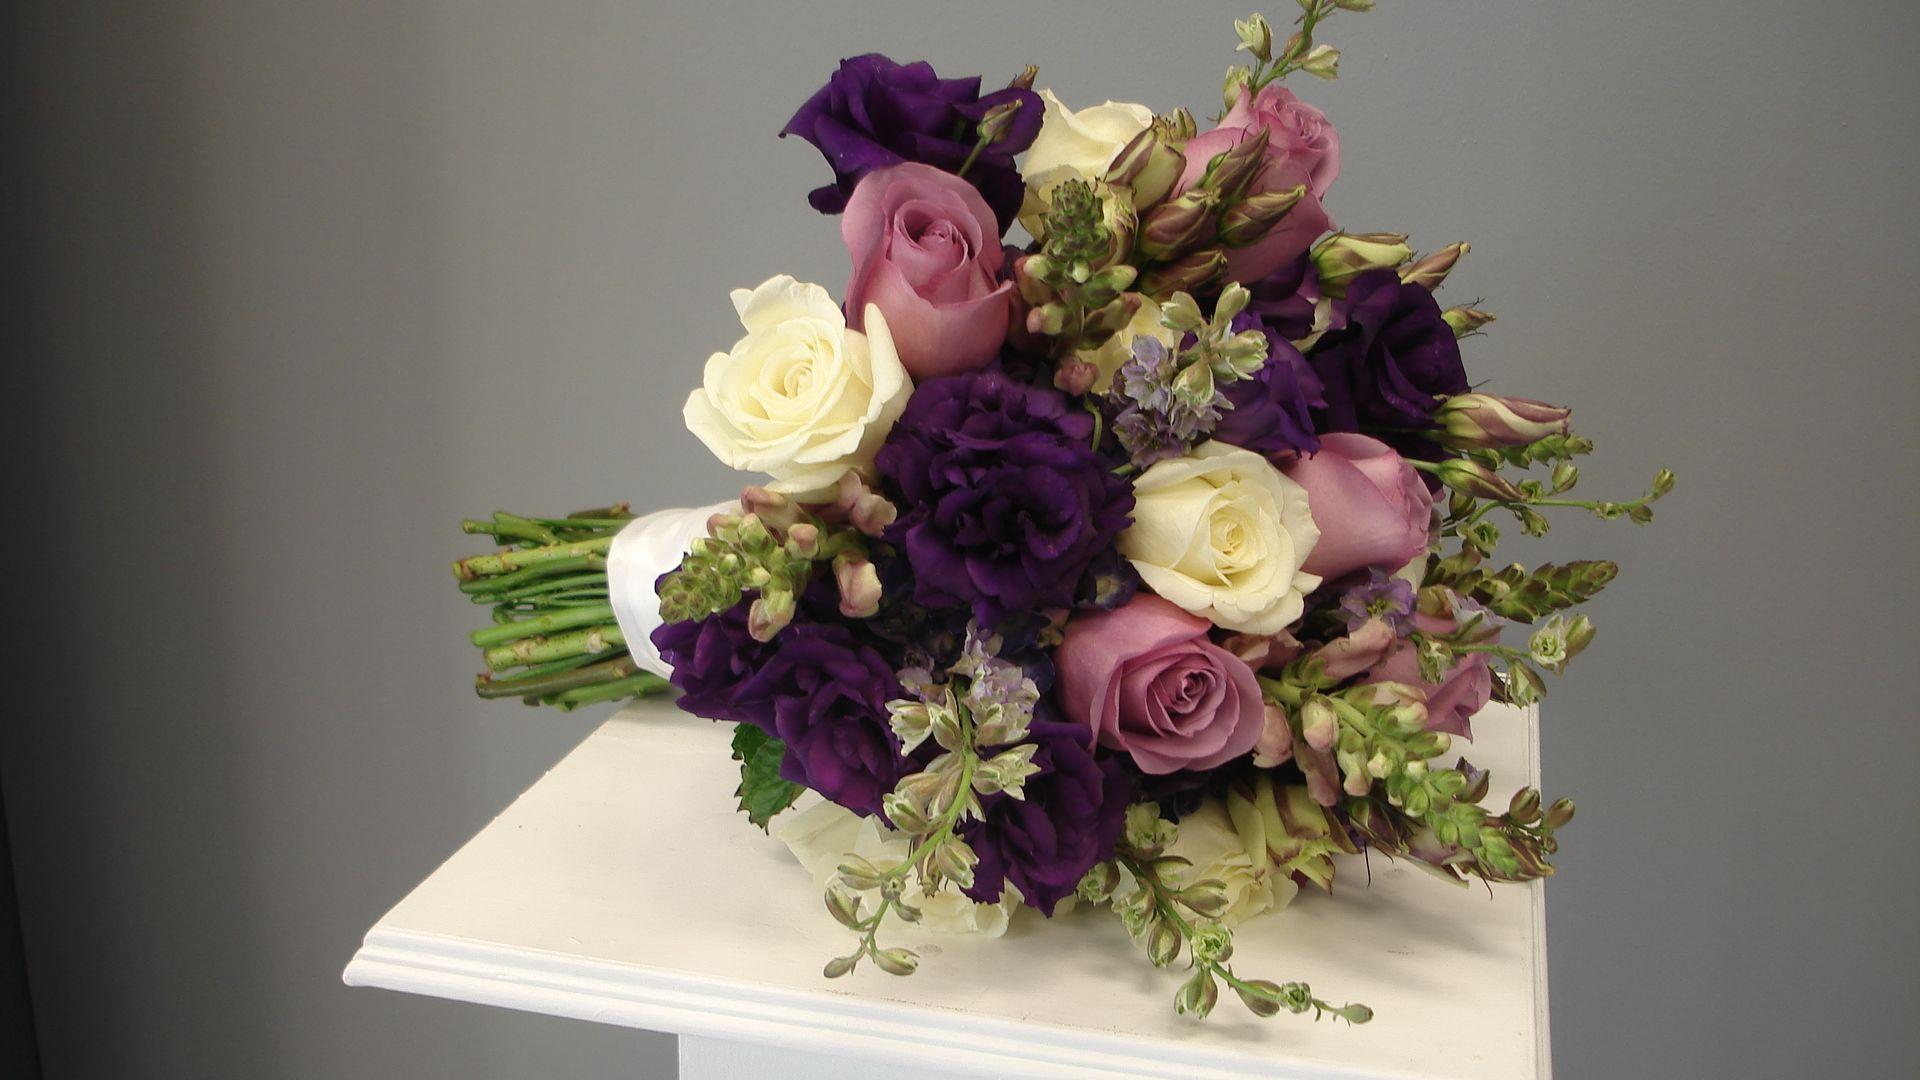 Purple Flowers Bouquet 17 Hd Wallpaper - HdFlowerWallpaper.com